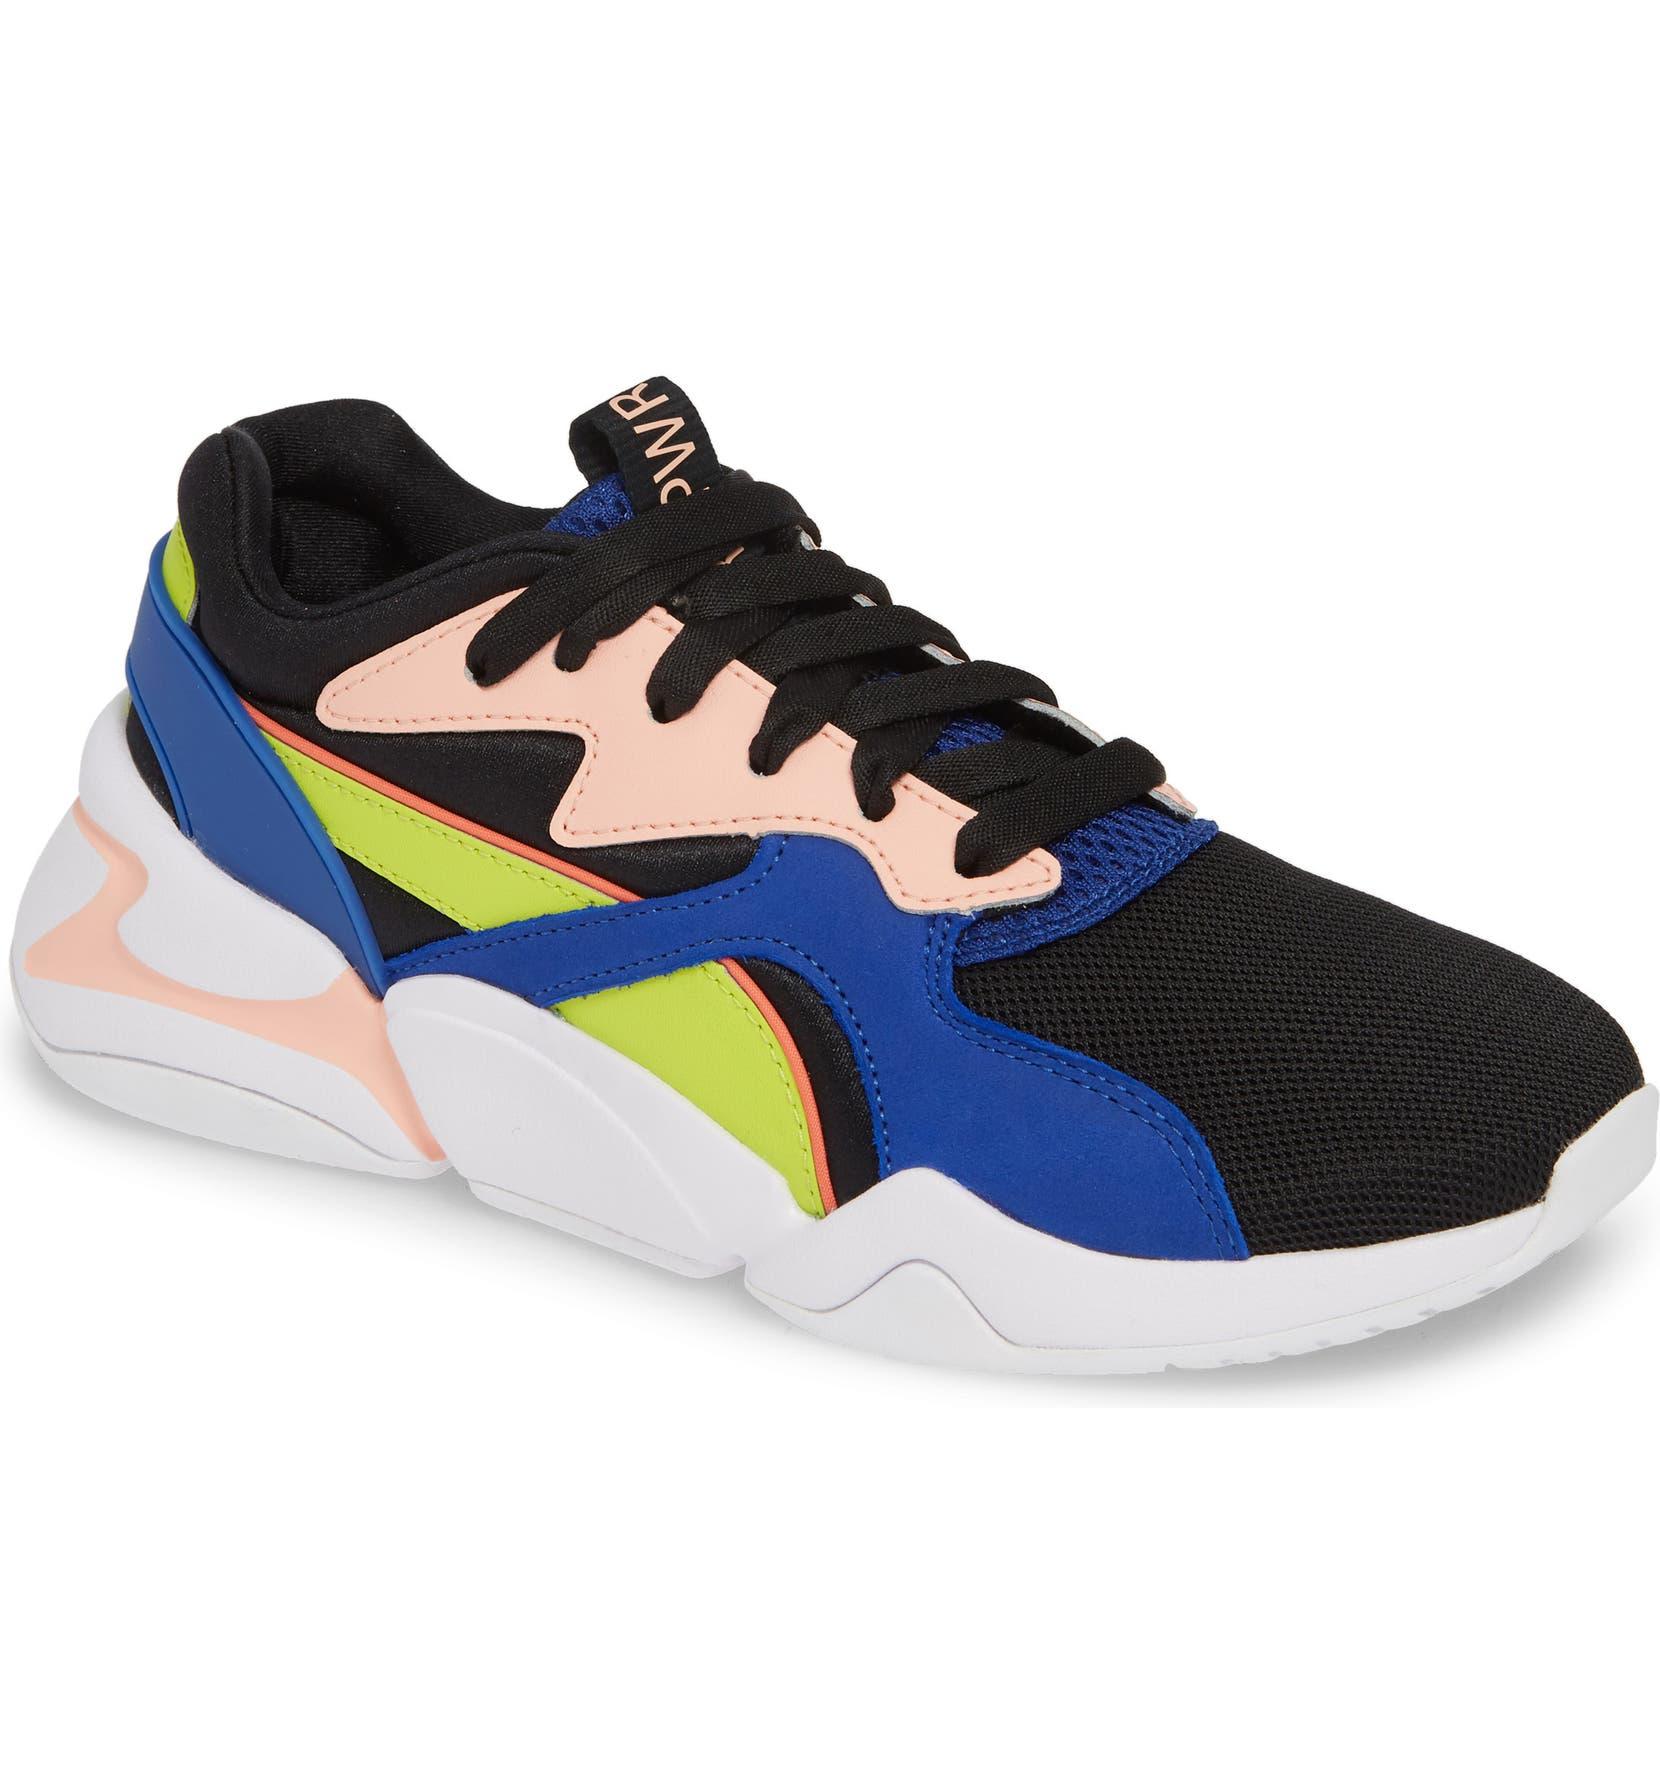 a3dd382e4b1 PUMA Nova GRL PWR Sneaker (Women)